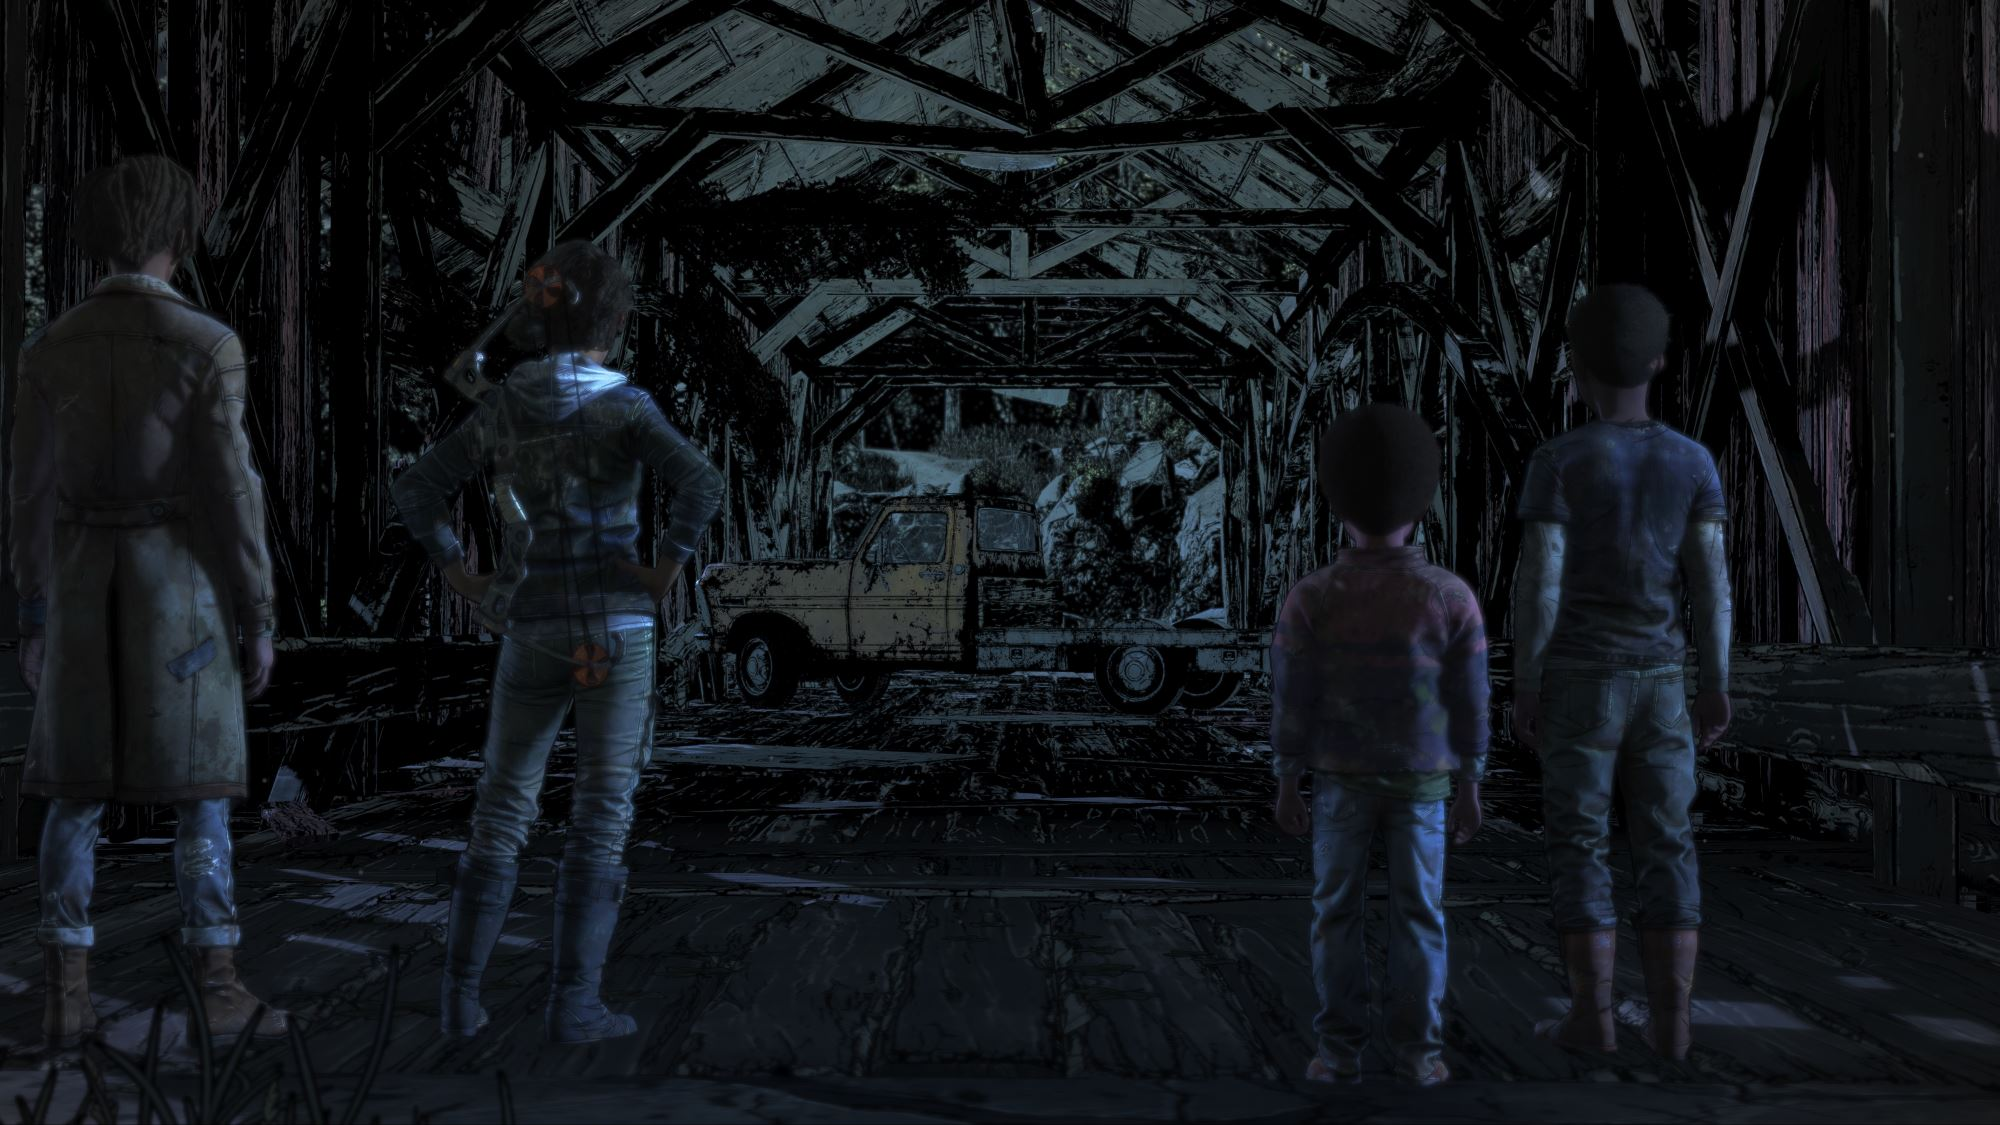 Final Episode Of The Walking Dead: The Telltale Series